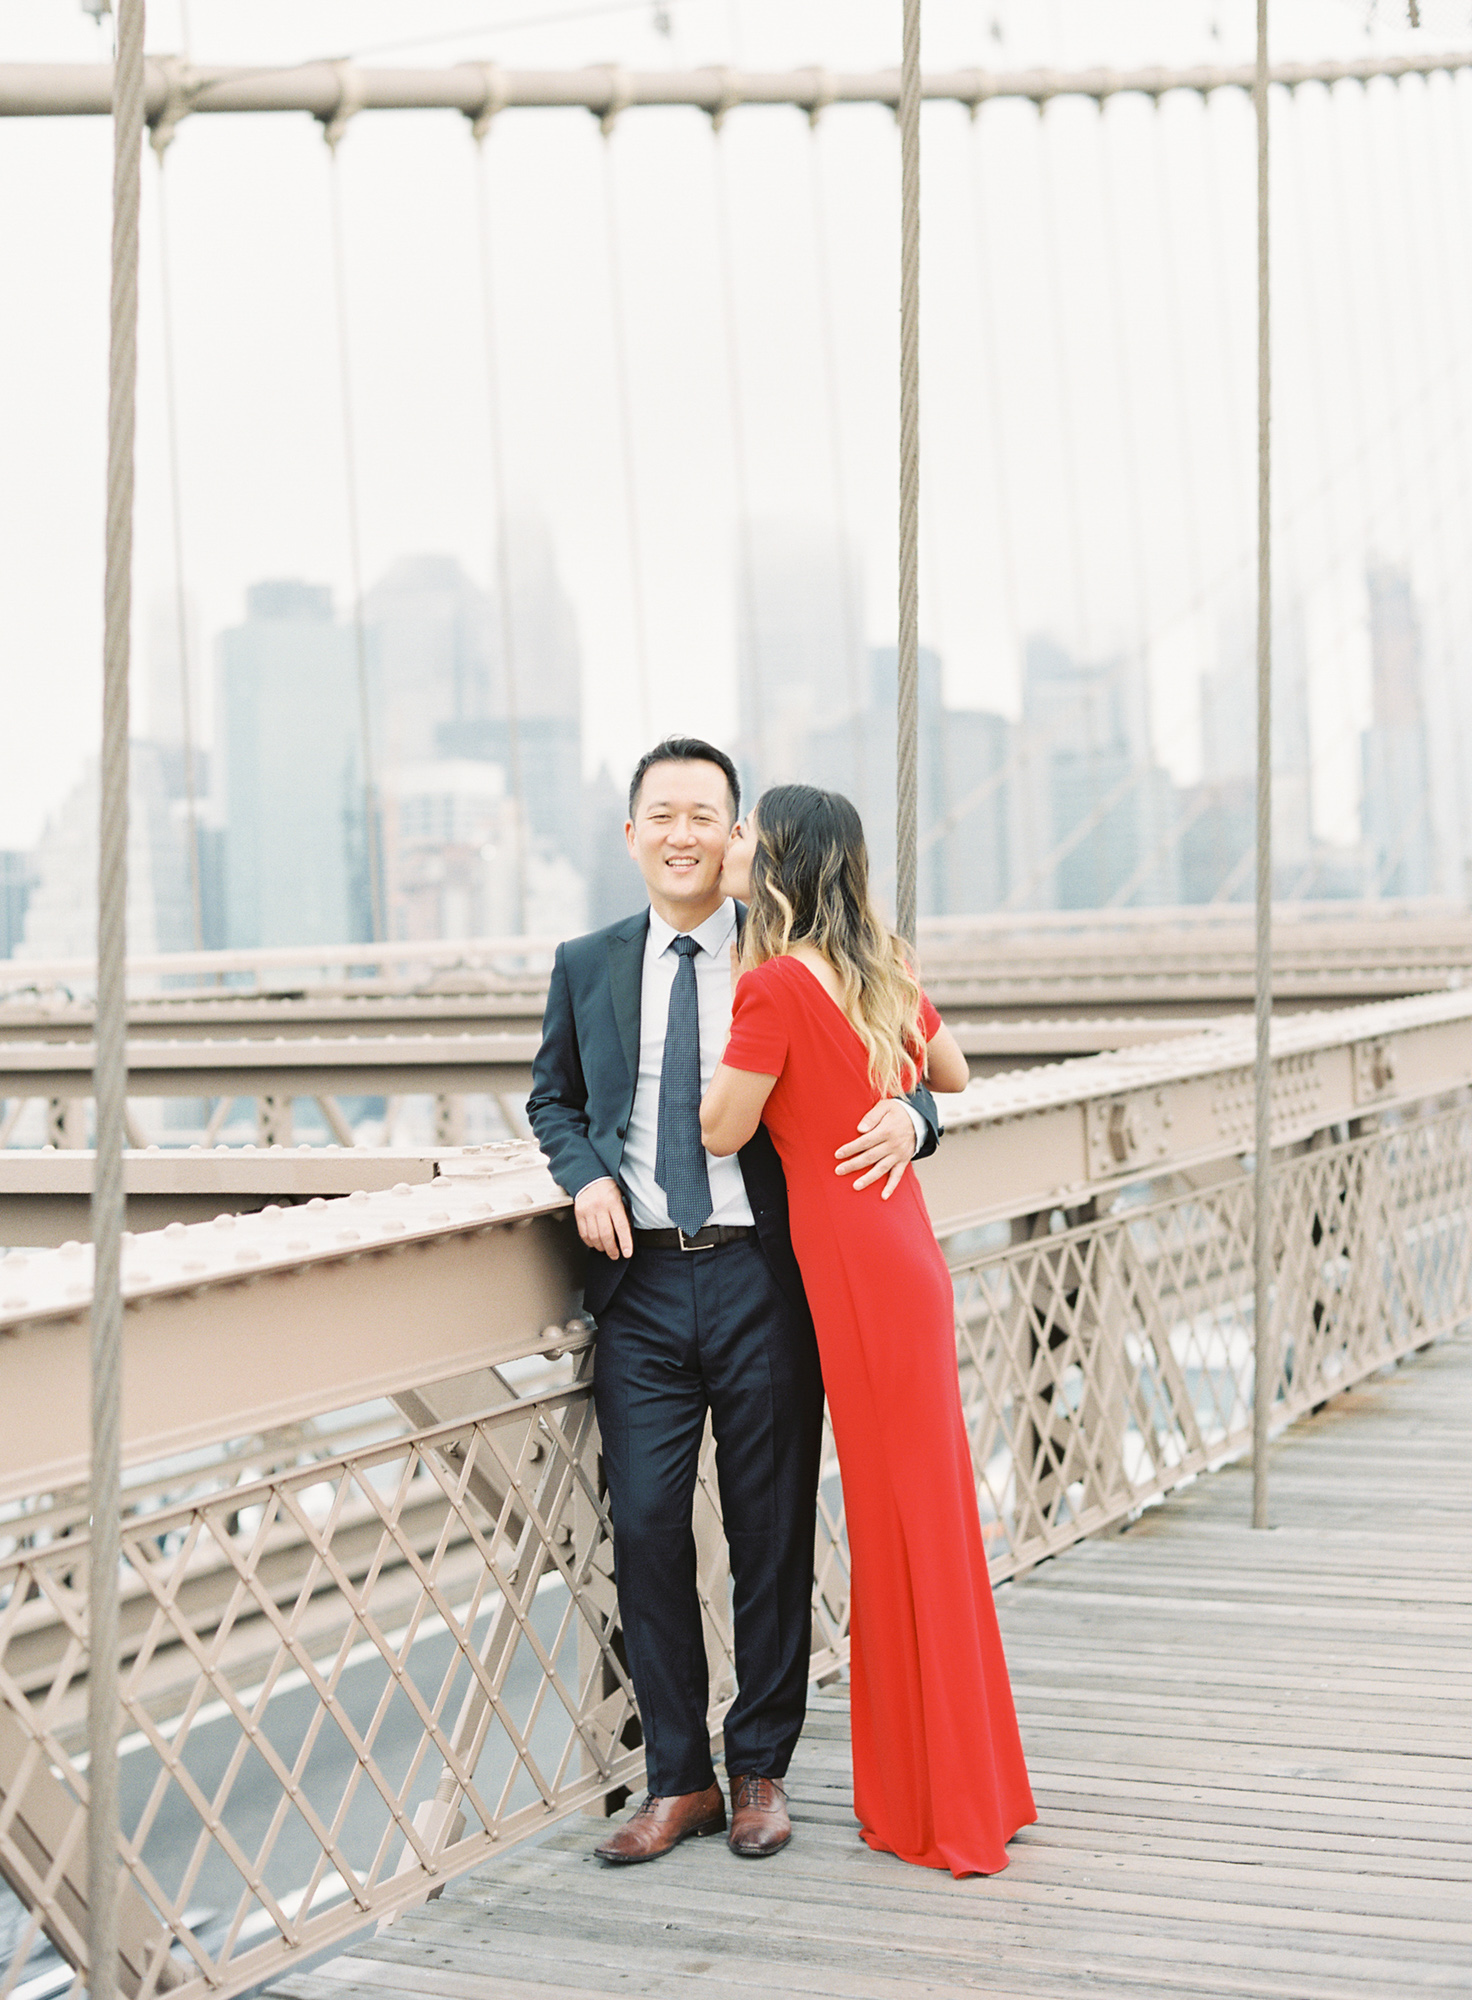 New-York-Film-Engagement-Session-Brooklyn-Bridge-Central-Park-1.jpg